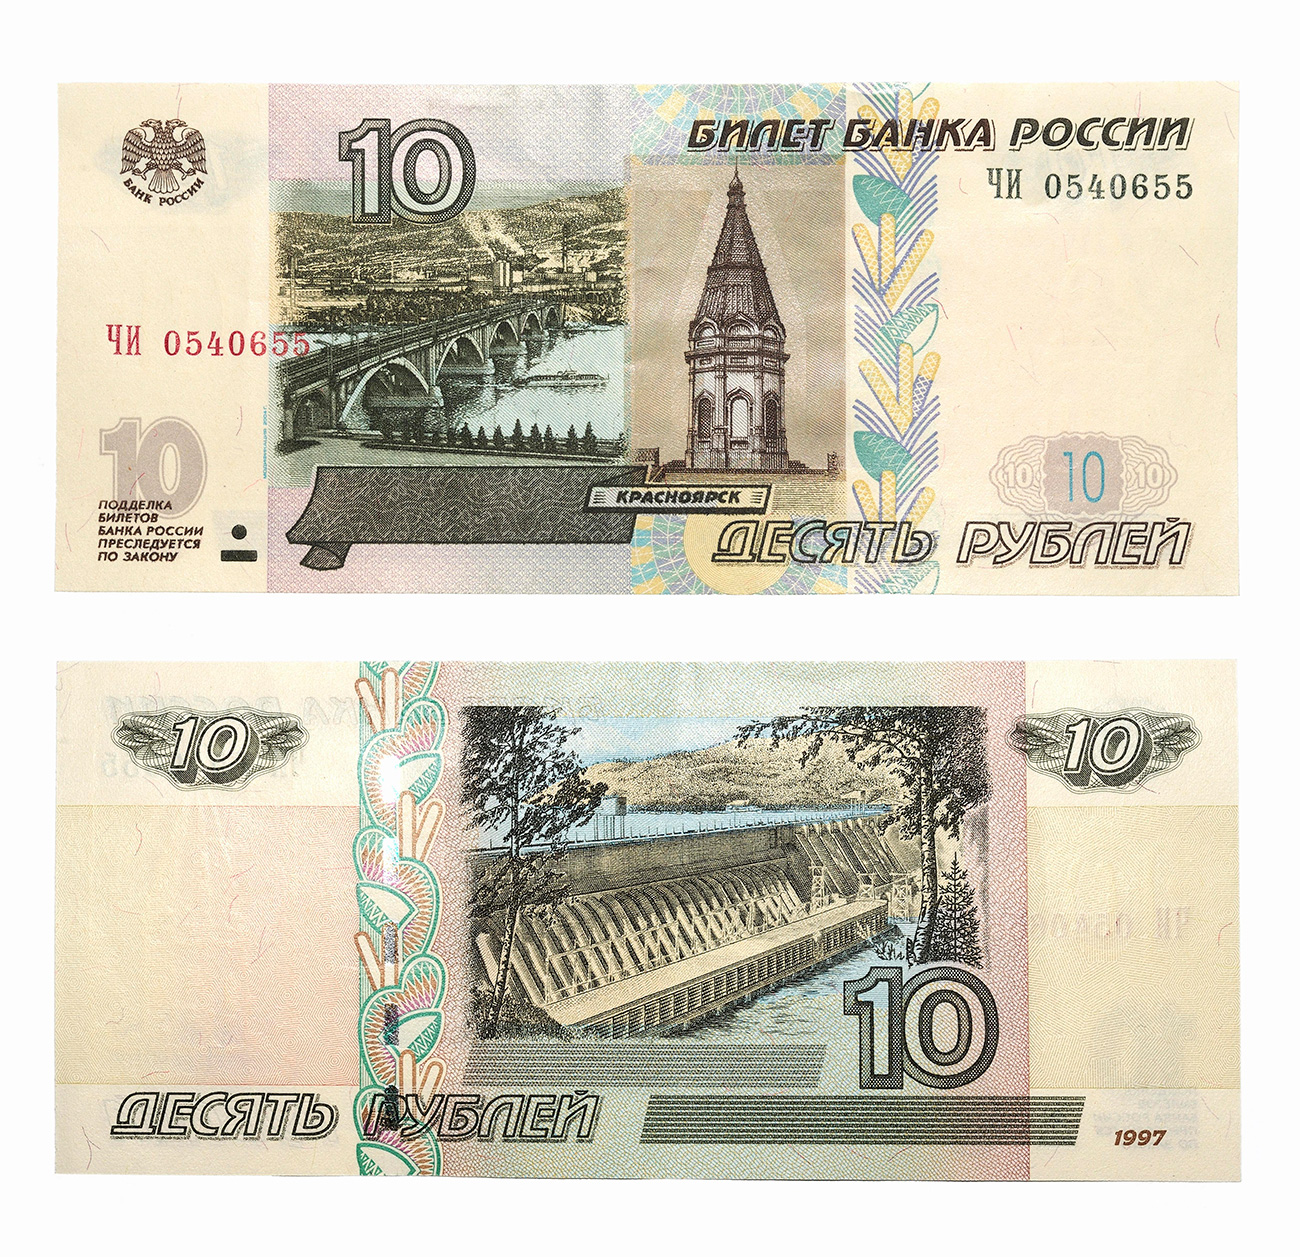 10 rubles / Global Look Press